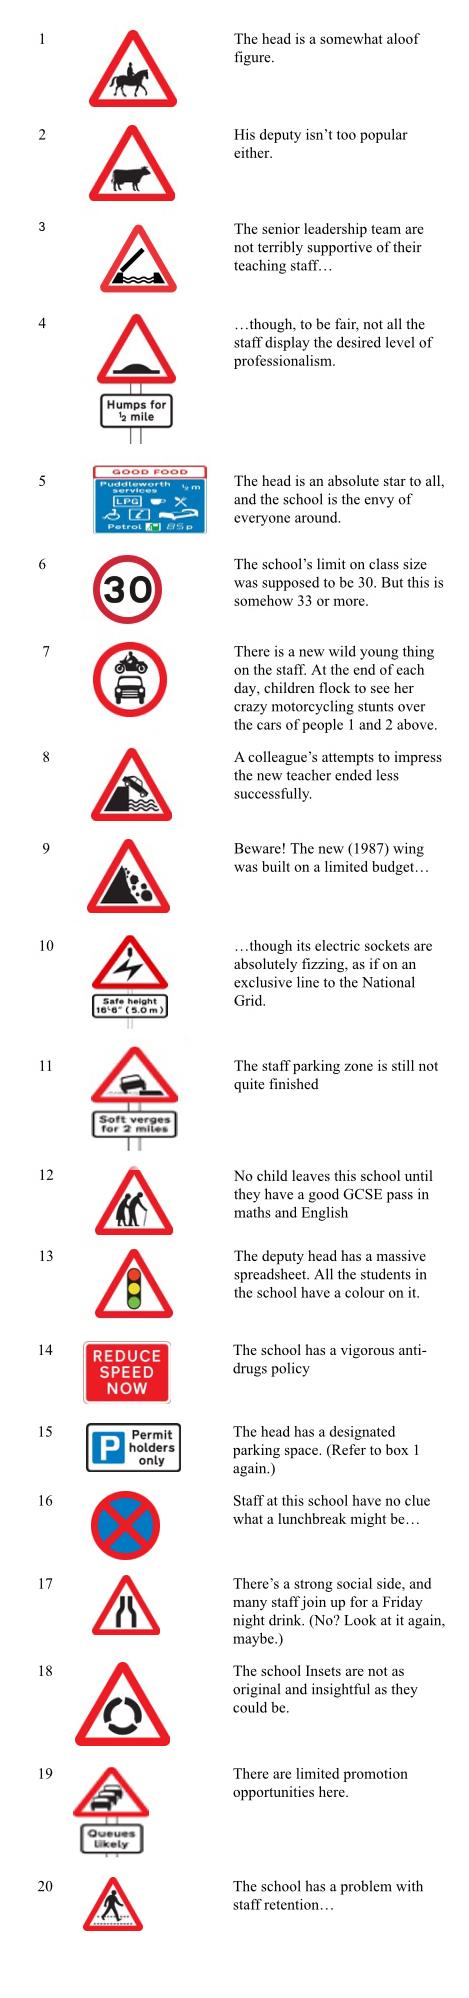 Alternative interpretations of road signs, for a school and teacher context